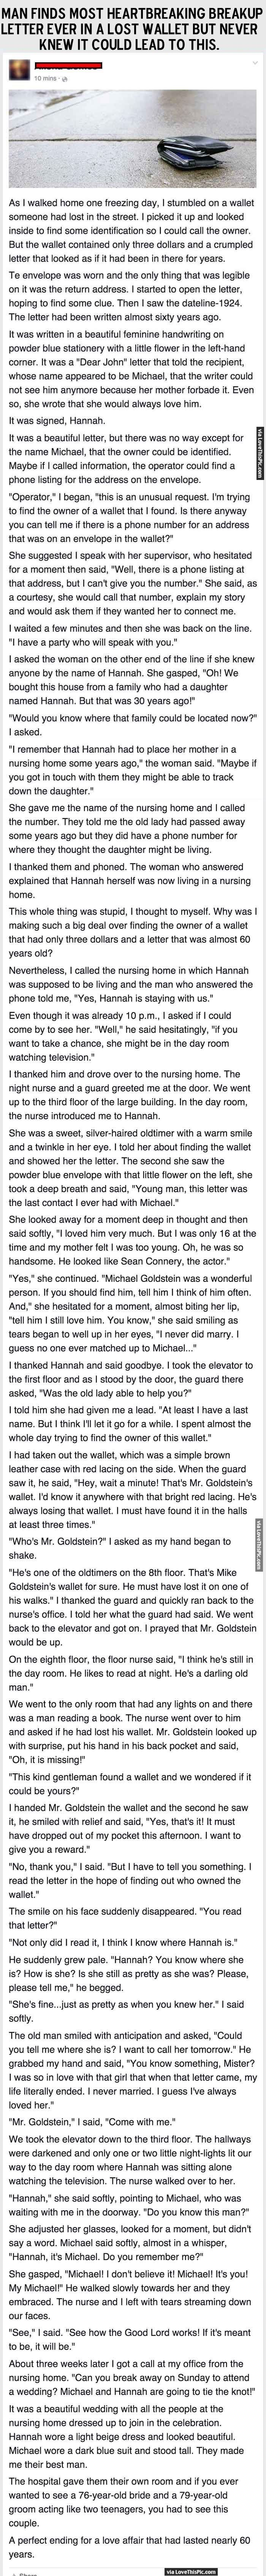 Man Finds Most Heartbreaking Breakup Letter Ever In A Lost